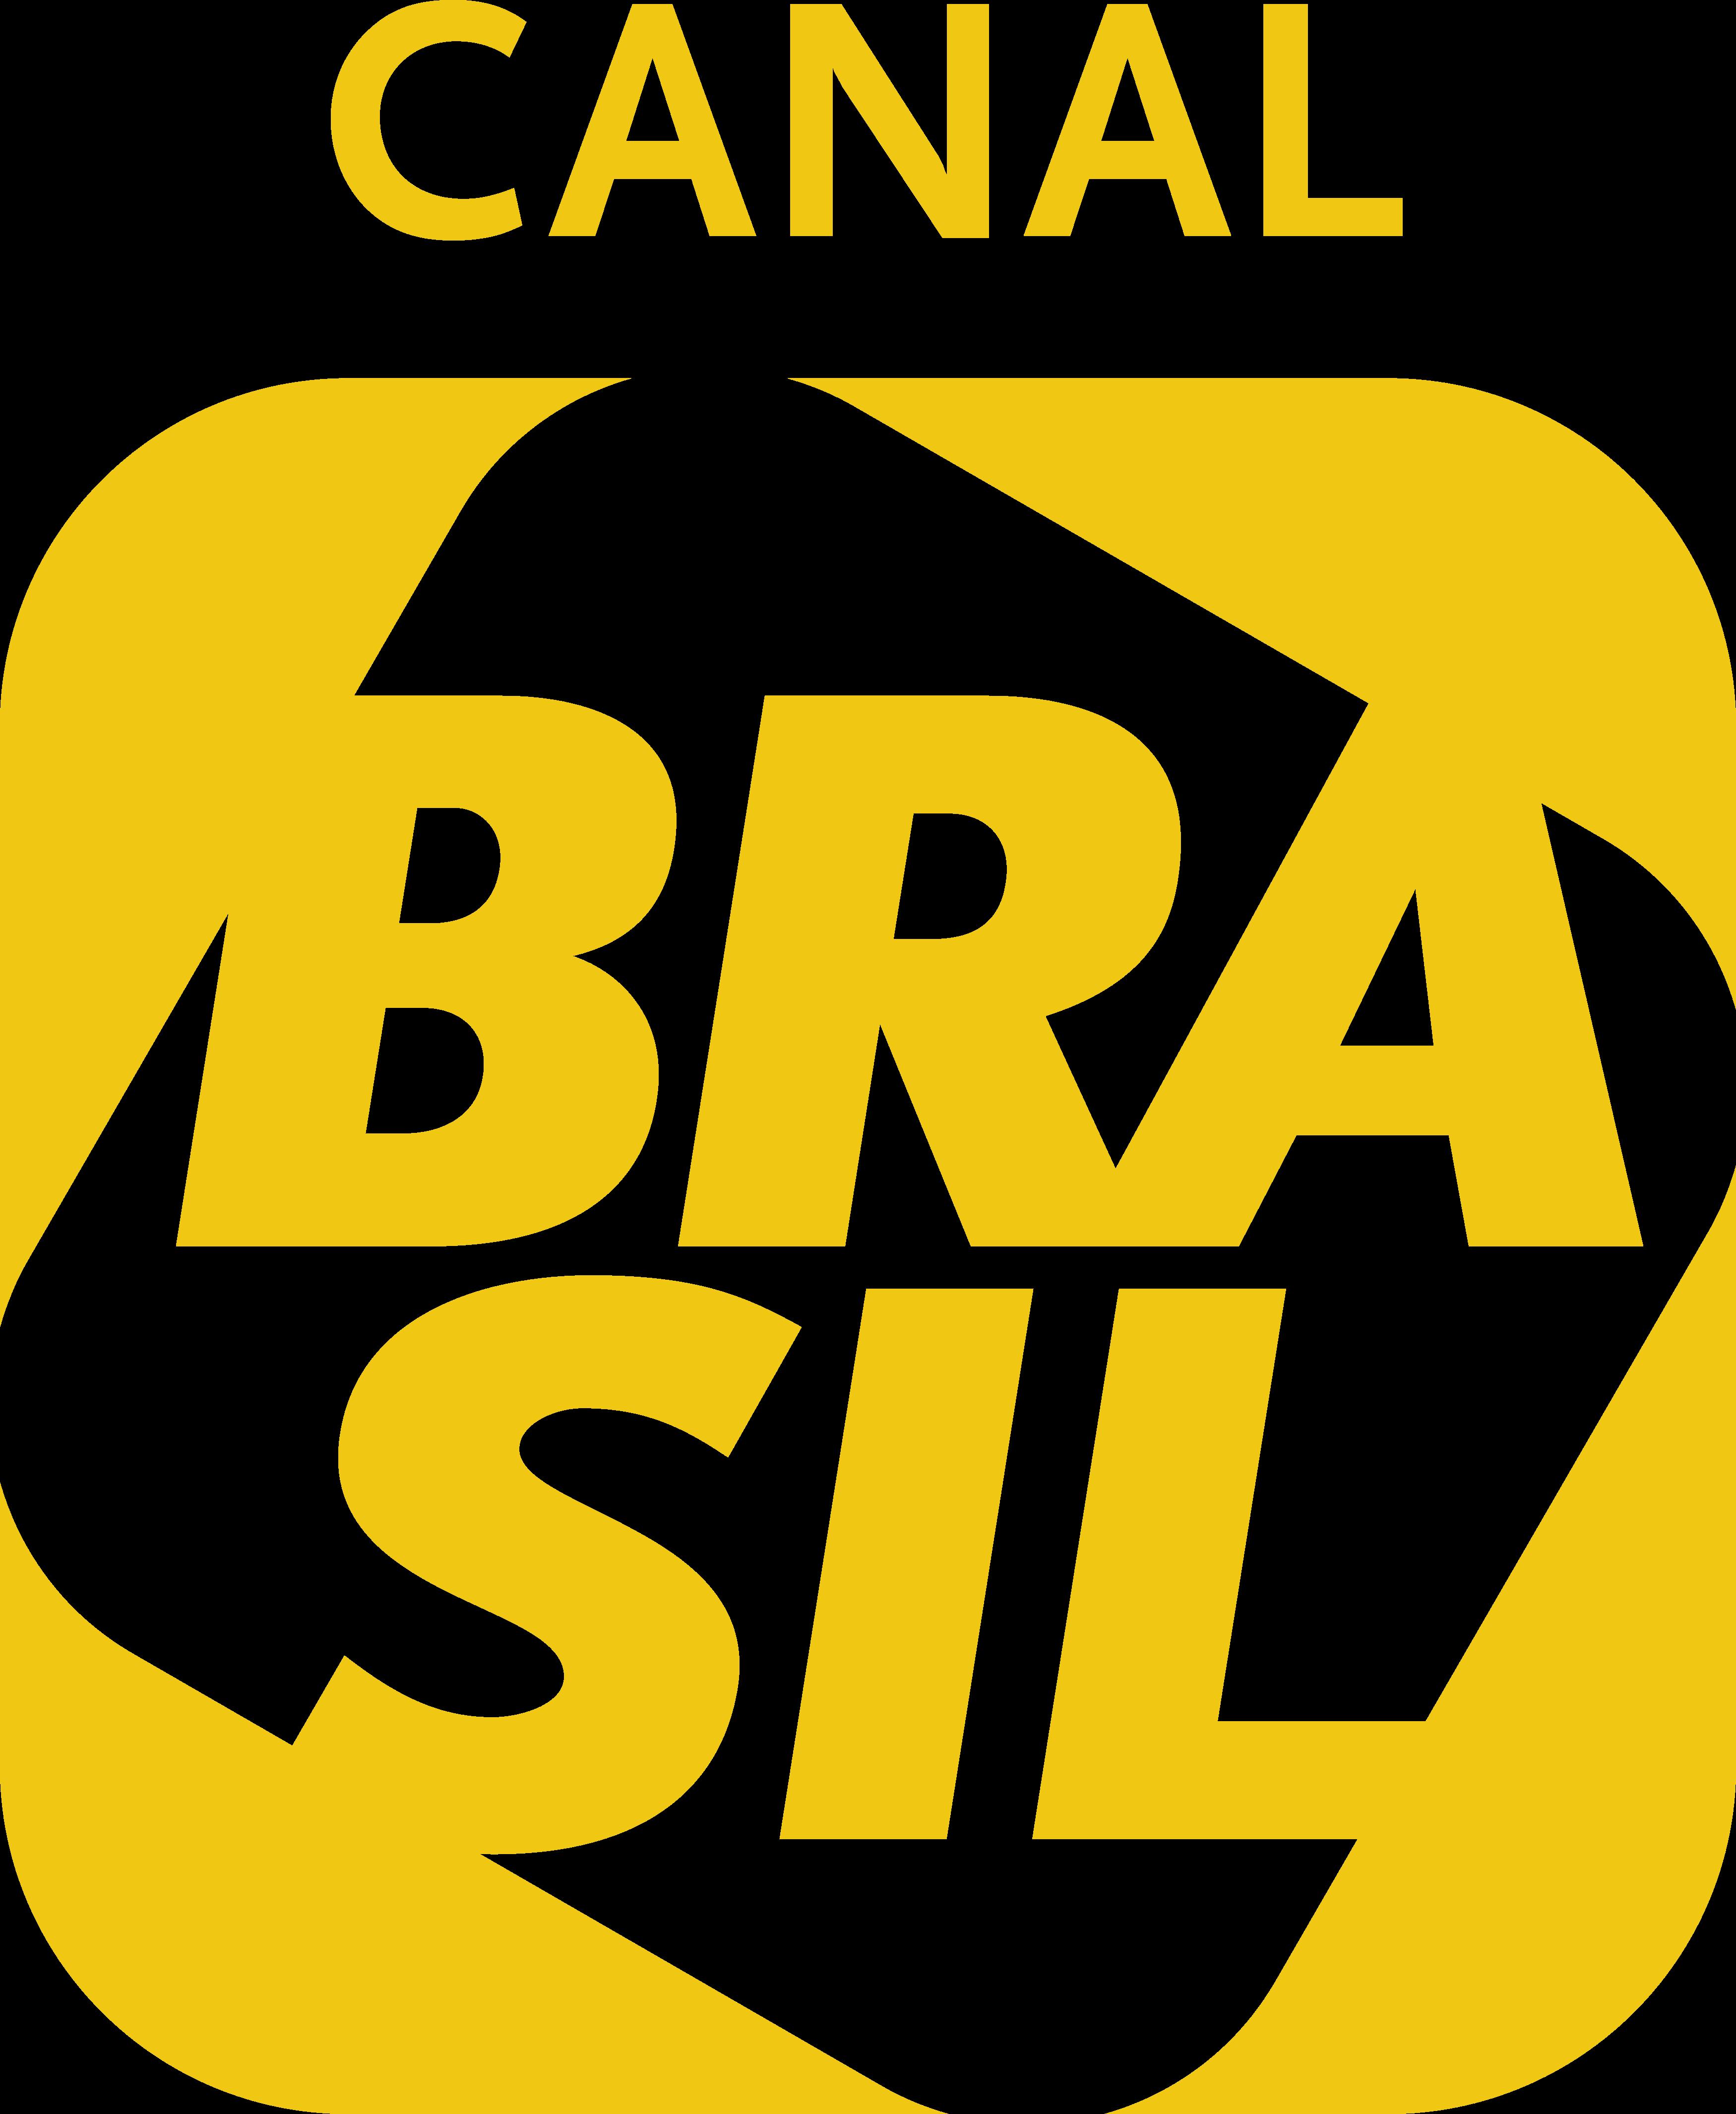 Canal Brasil Logo.